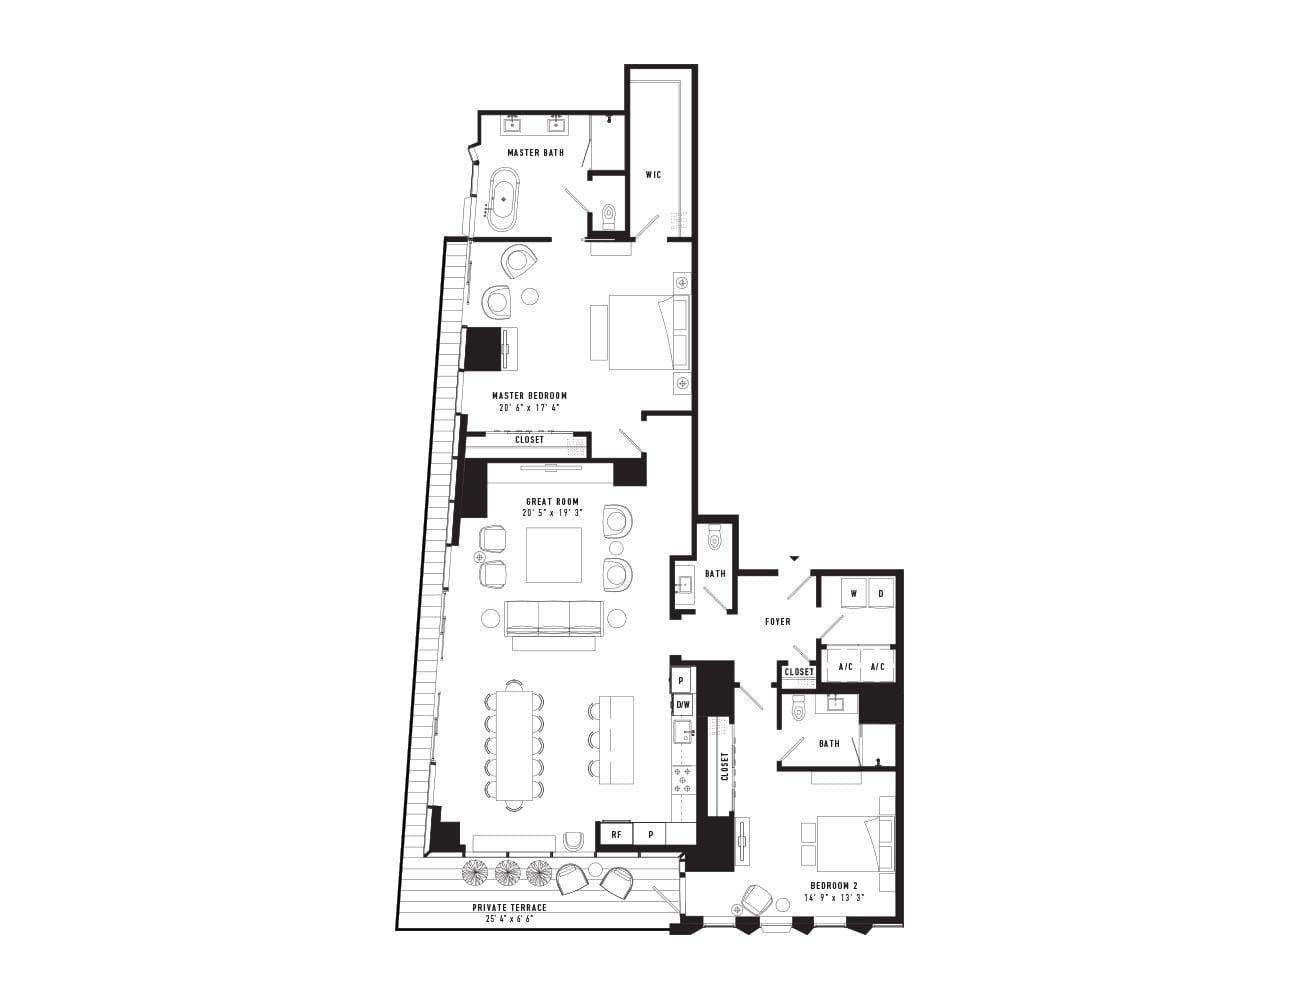 Condo Floor Plans Downtown Austin Tx Austin Proper Residences Condo Floor Plans Floor Plans Downtown Austin